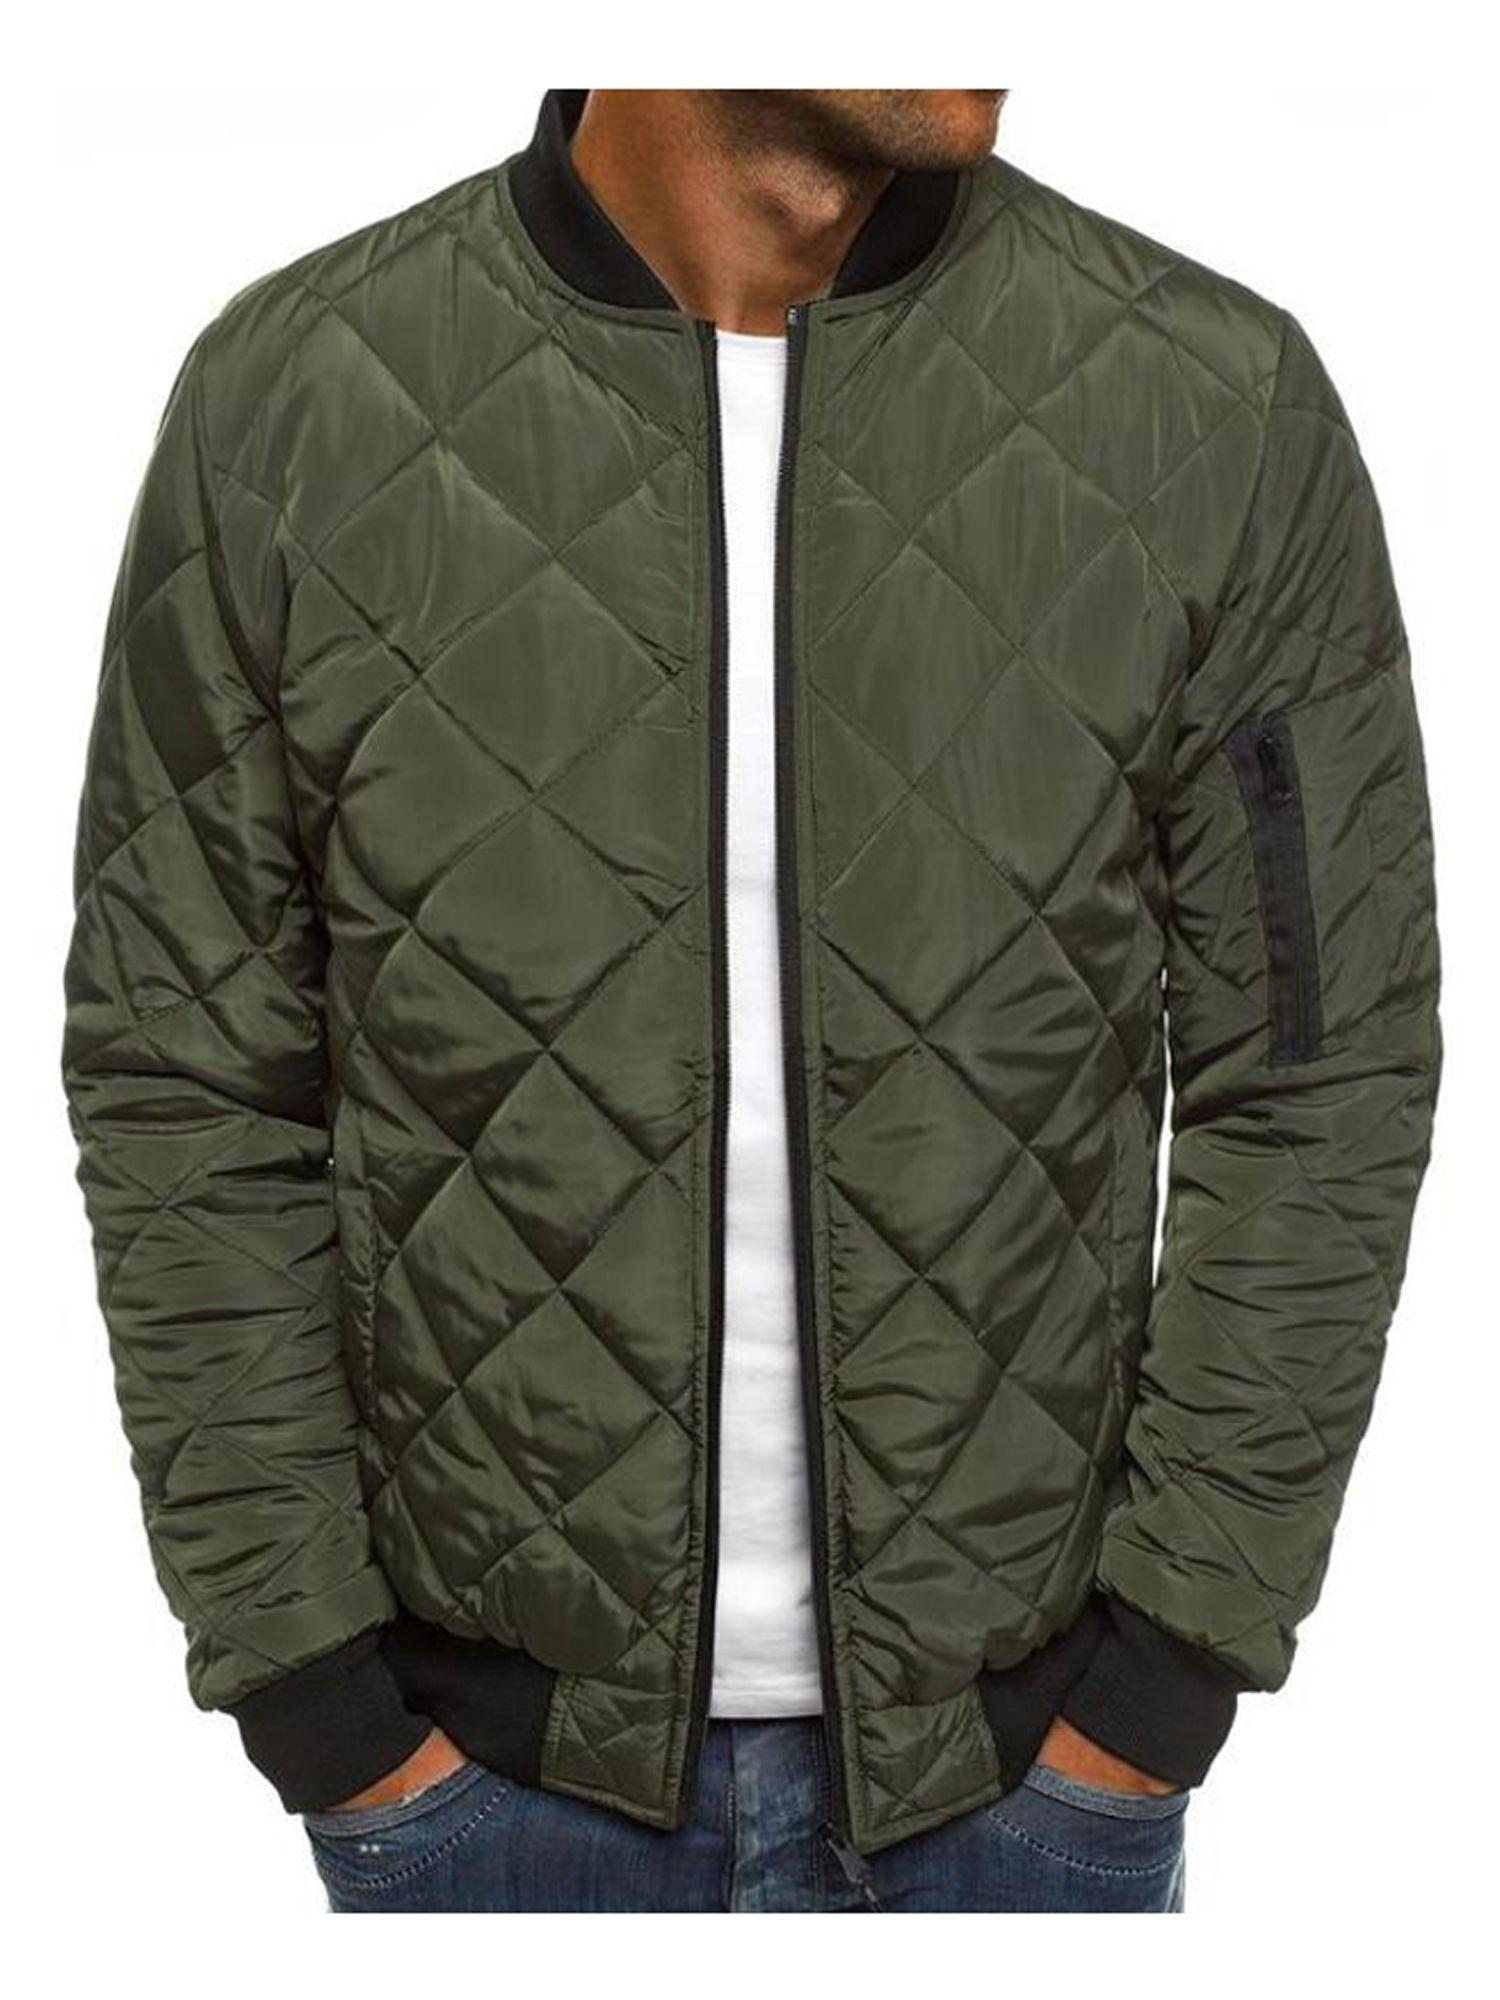 Men S Padded Quilted Puffer Bomber Jacket Zipper Coat Outwear Winter Tops Casual Walmart Com Winter Jacket Men Quilted Bomber Jacket Winter Jackets [ 2000 x 1500 Pixel ]